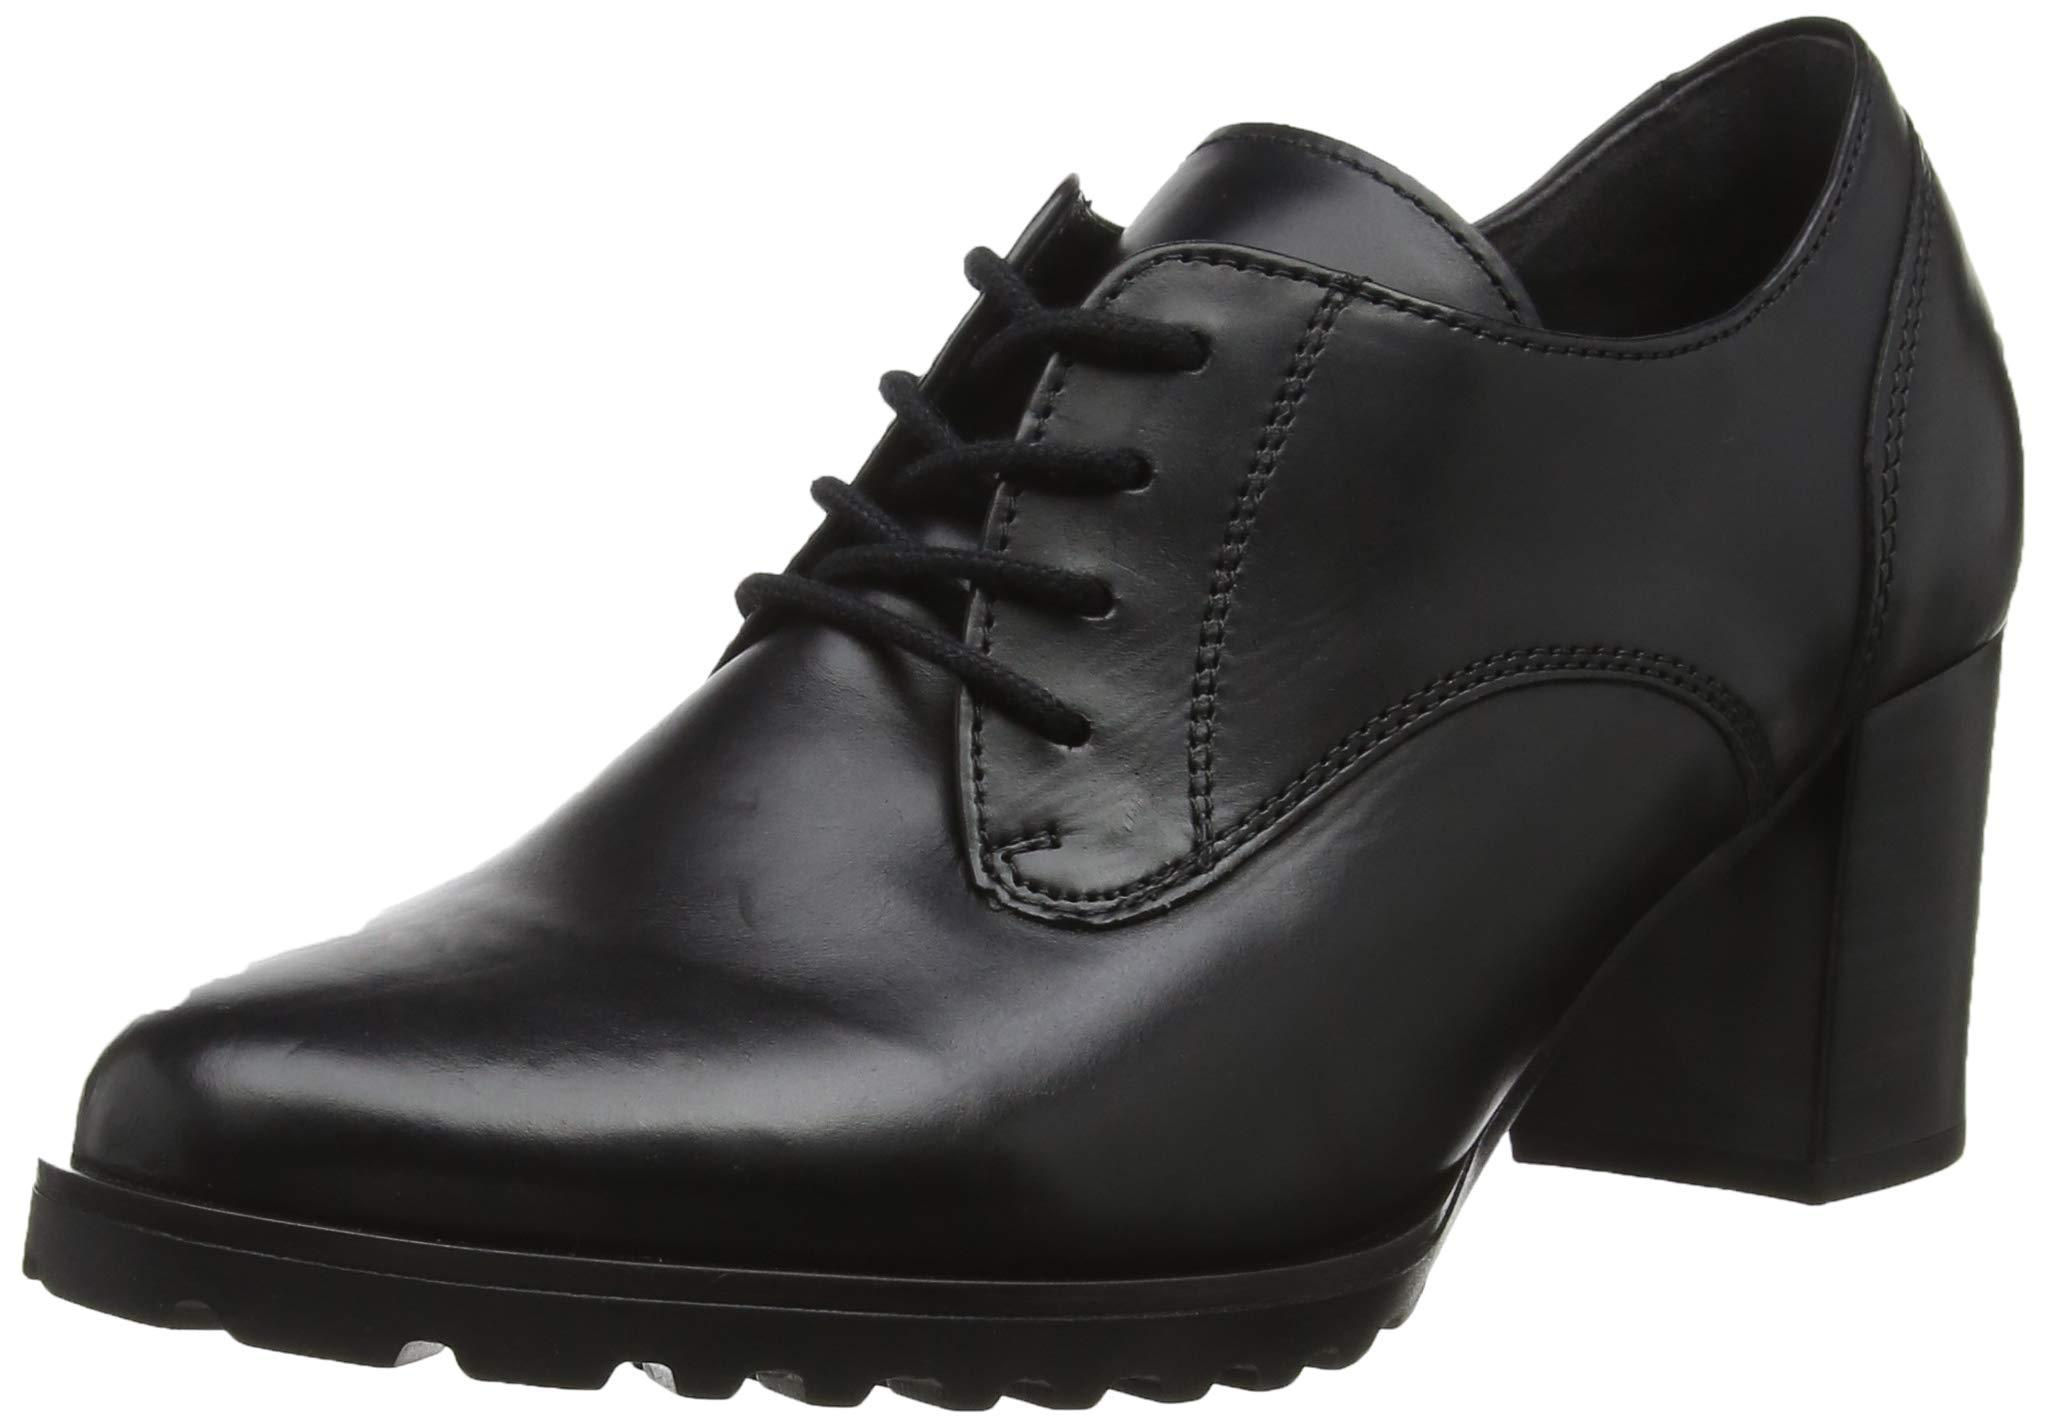 Eu FemmeNoirschwarz Shoes 2740 Gabor FashionEscarpins QdshtrC